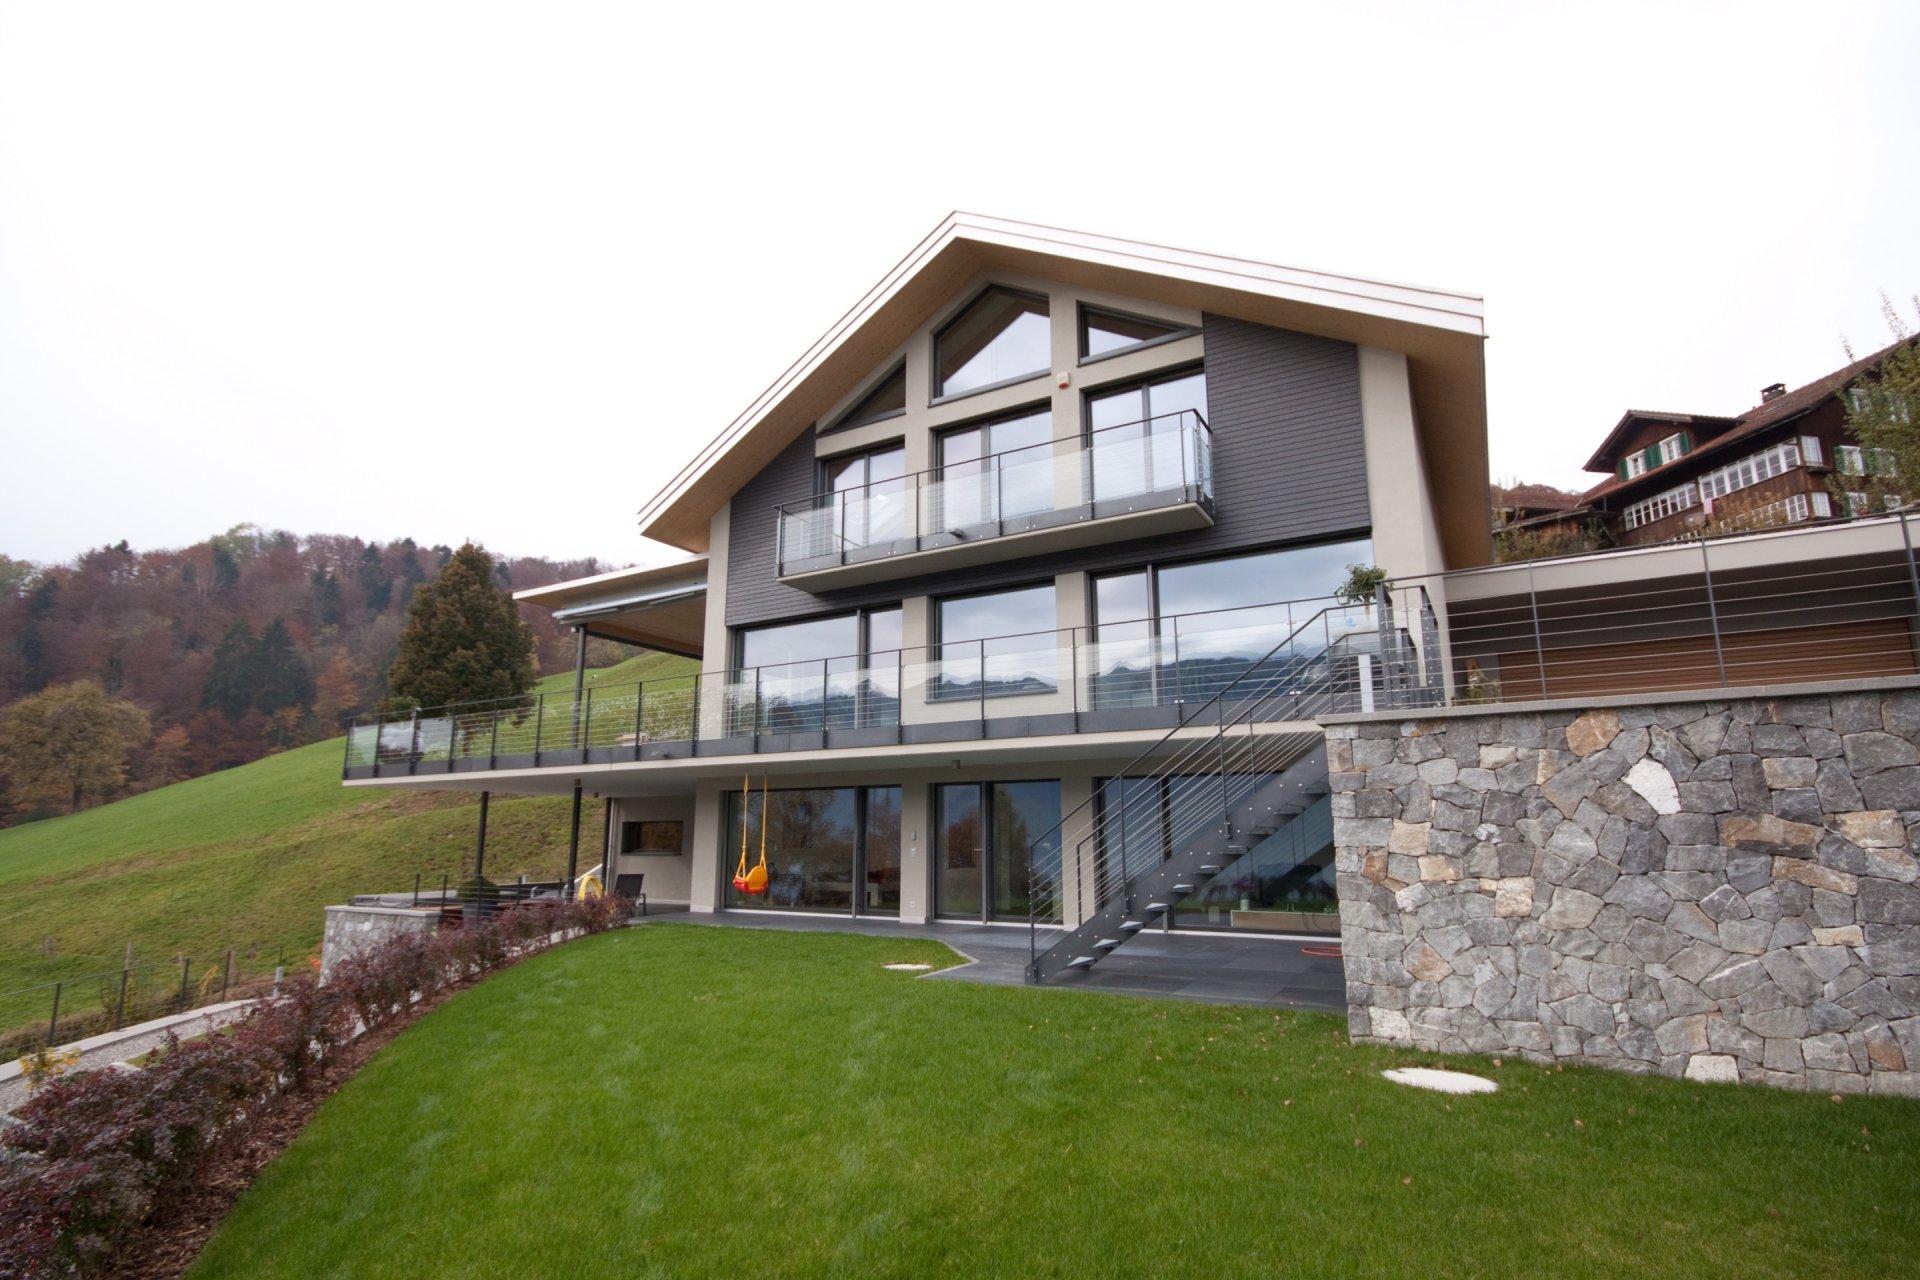 Holzbautechnik burch ag sarnen luzern neubau for Neubau einfamilienhaus